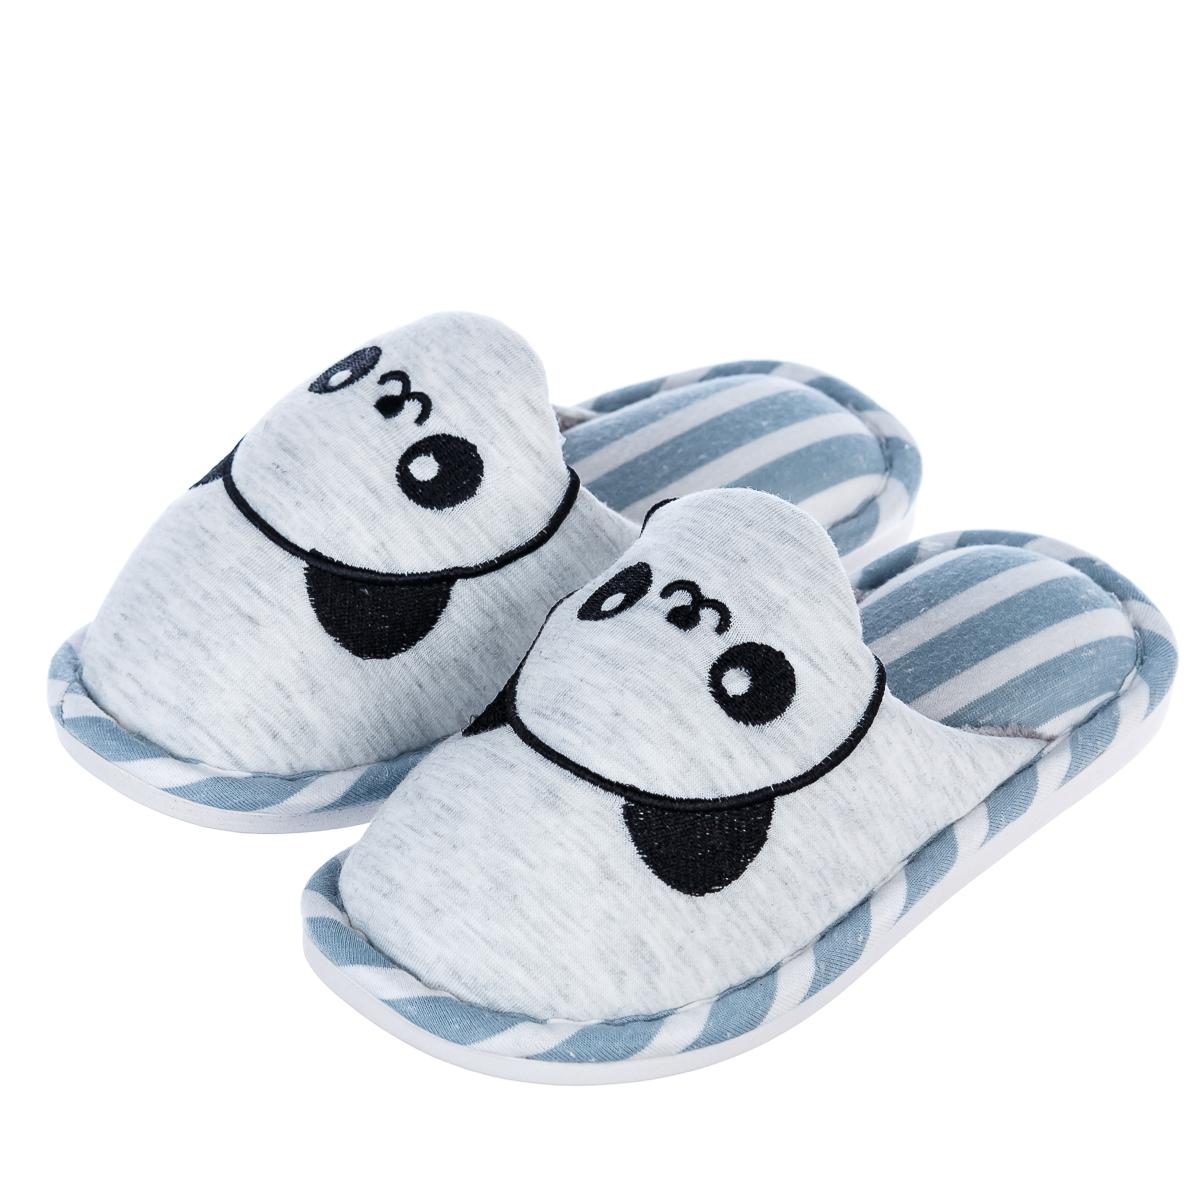 Тапочки детские с пандой домашние  р.27-28 серо-синие